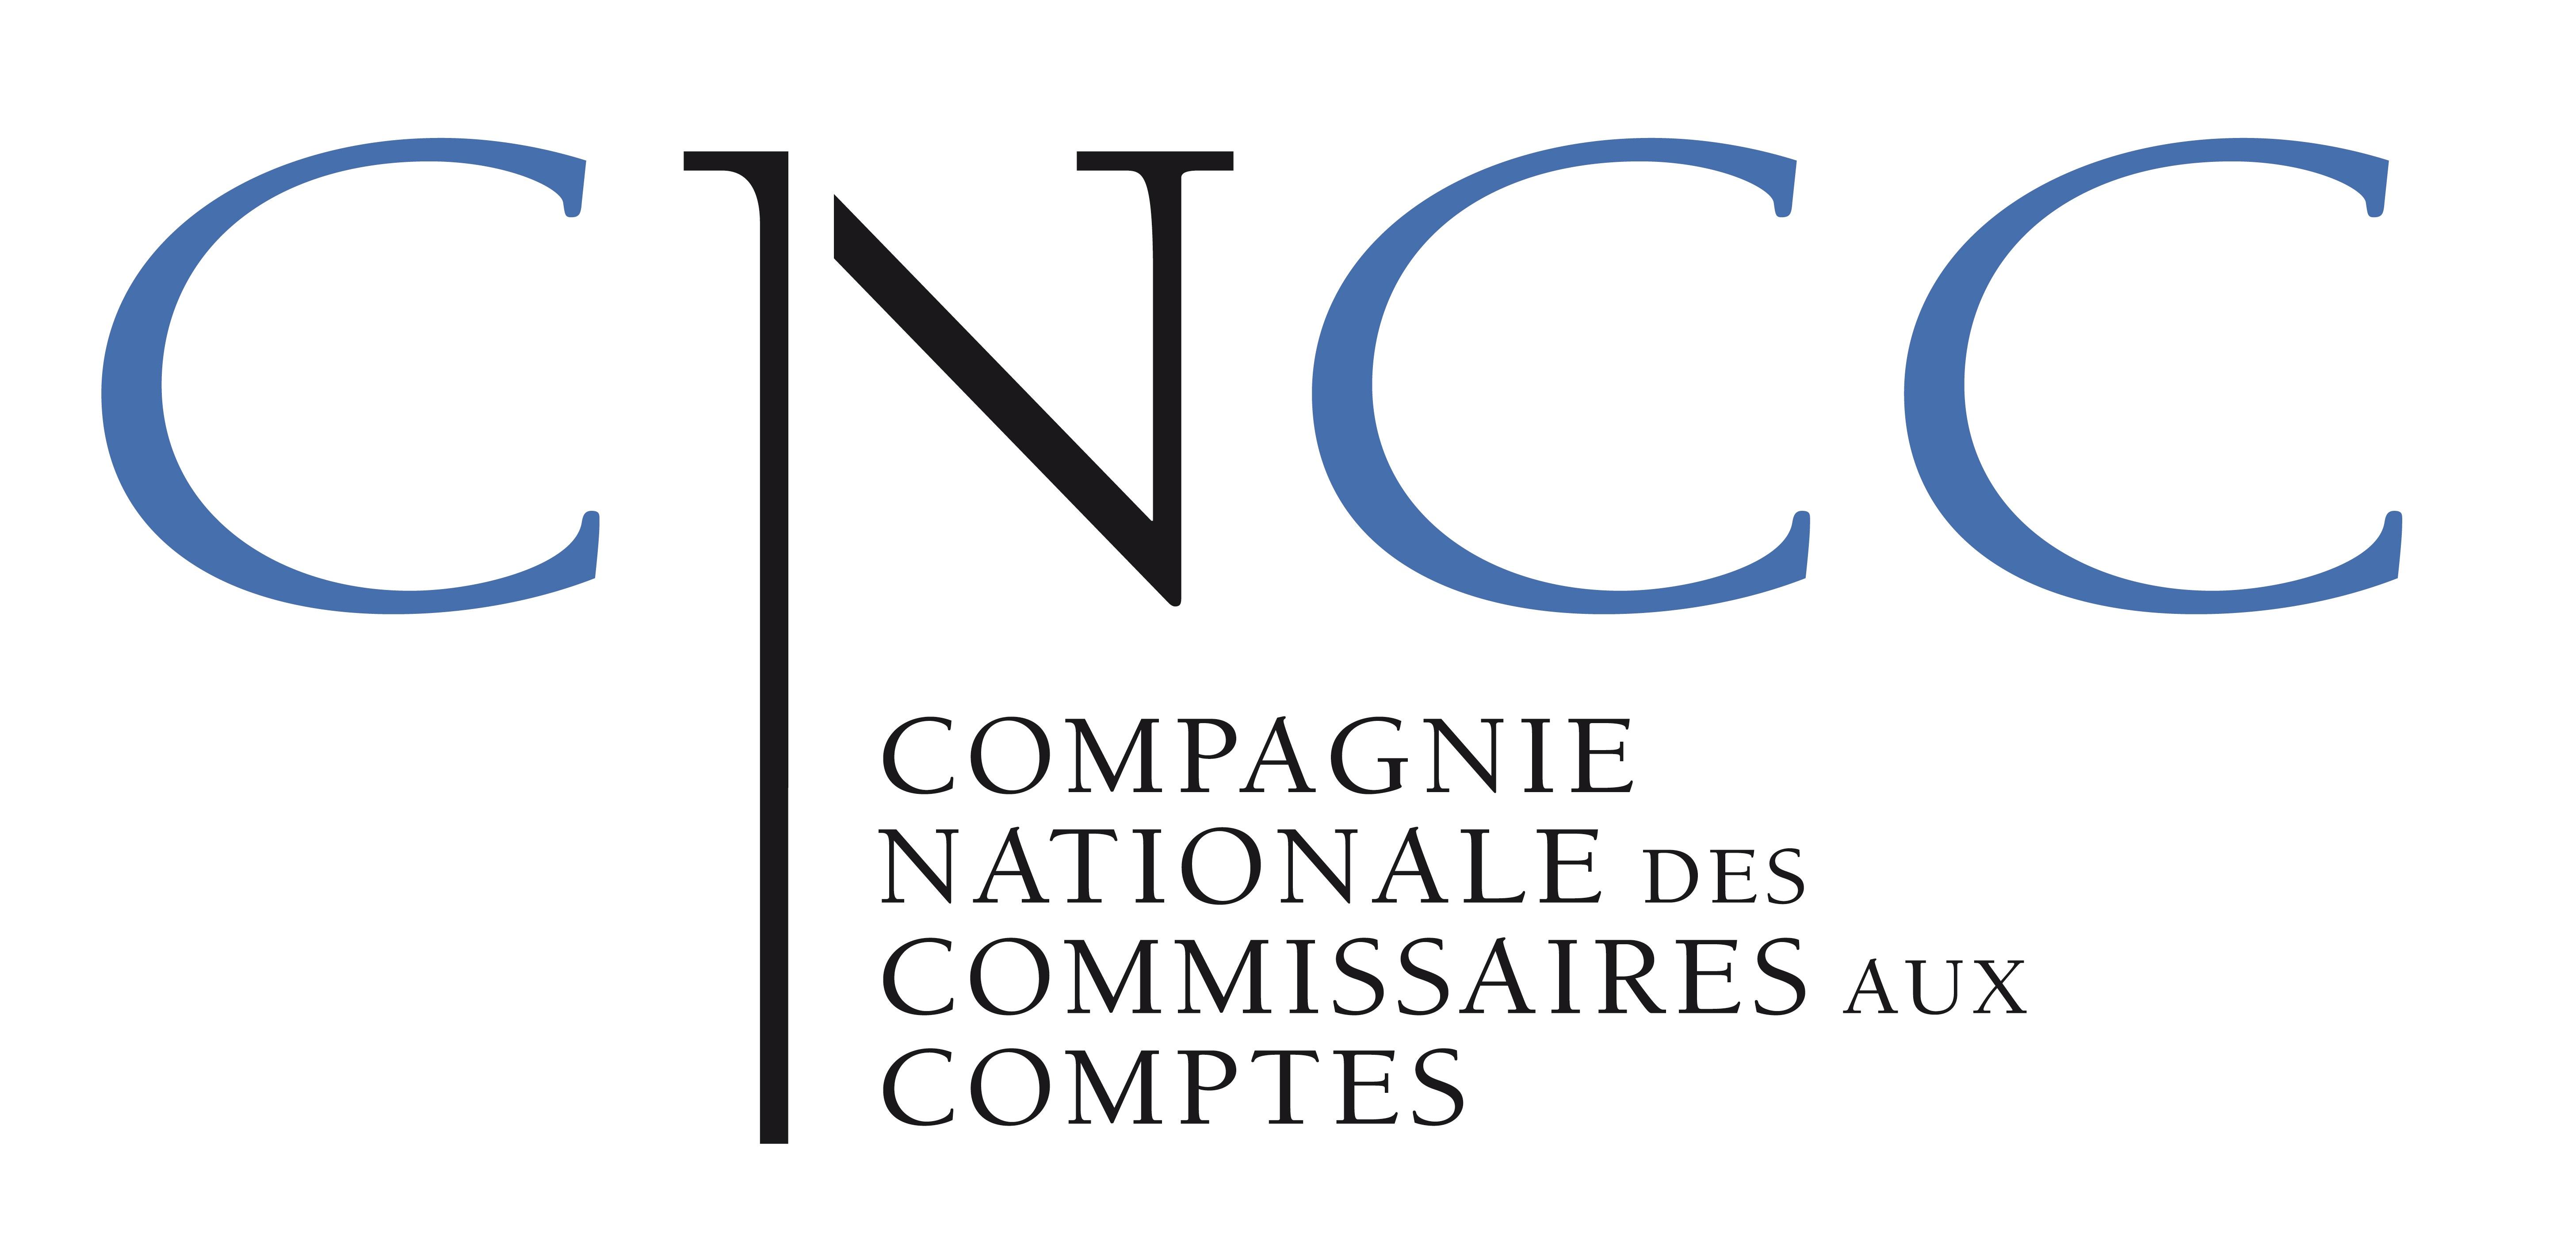 001 CNCC